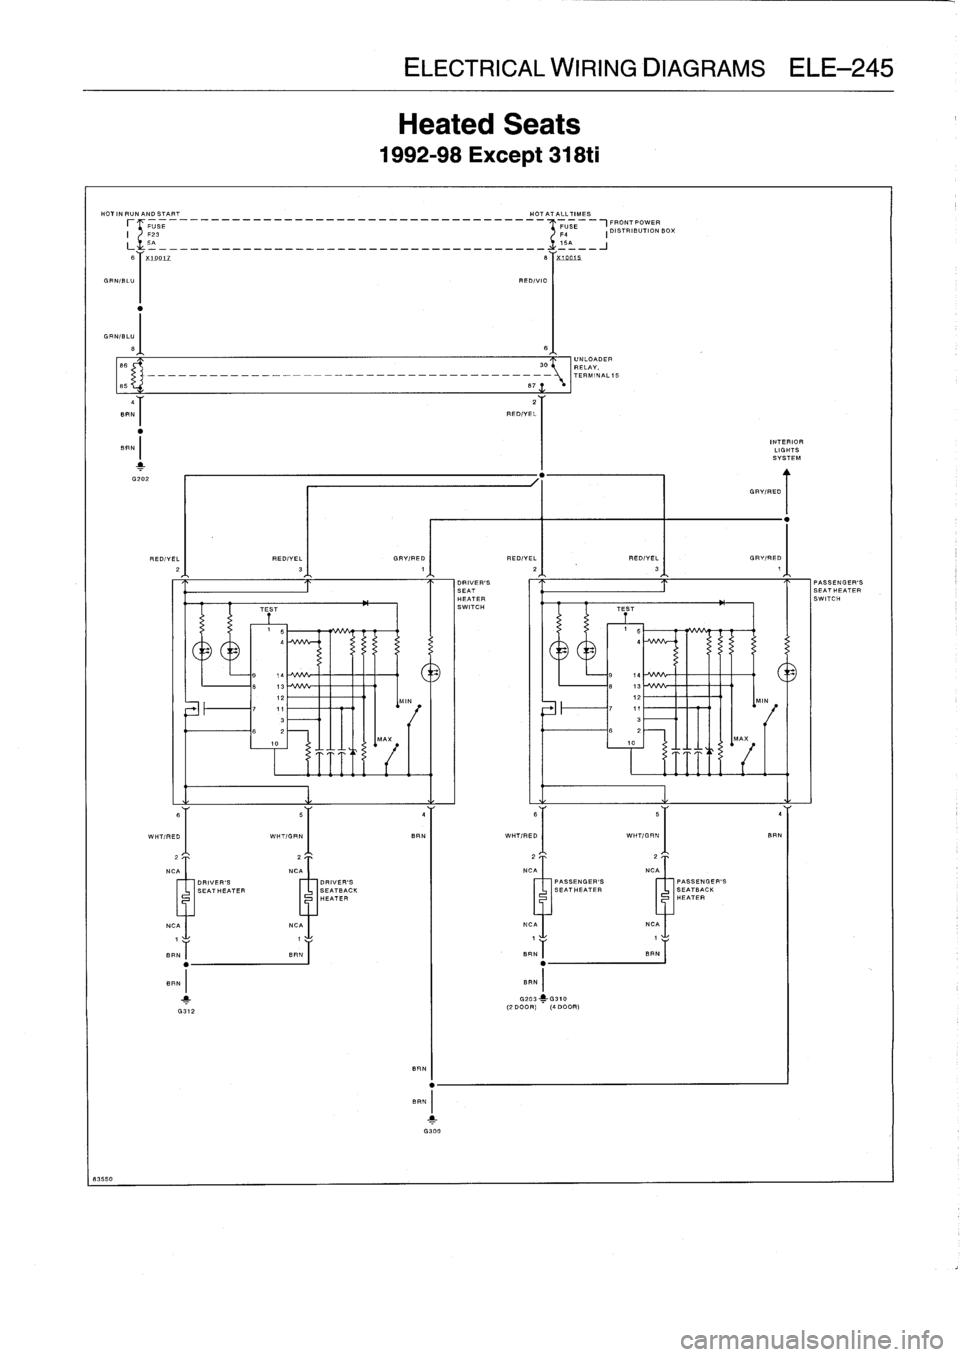 Bmw M3 1995 E36 Workshop Manual Mirror Wiring Diagram Page 728 83550 Electrical